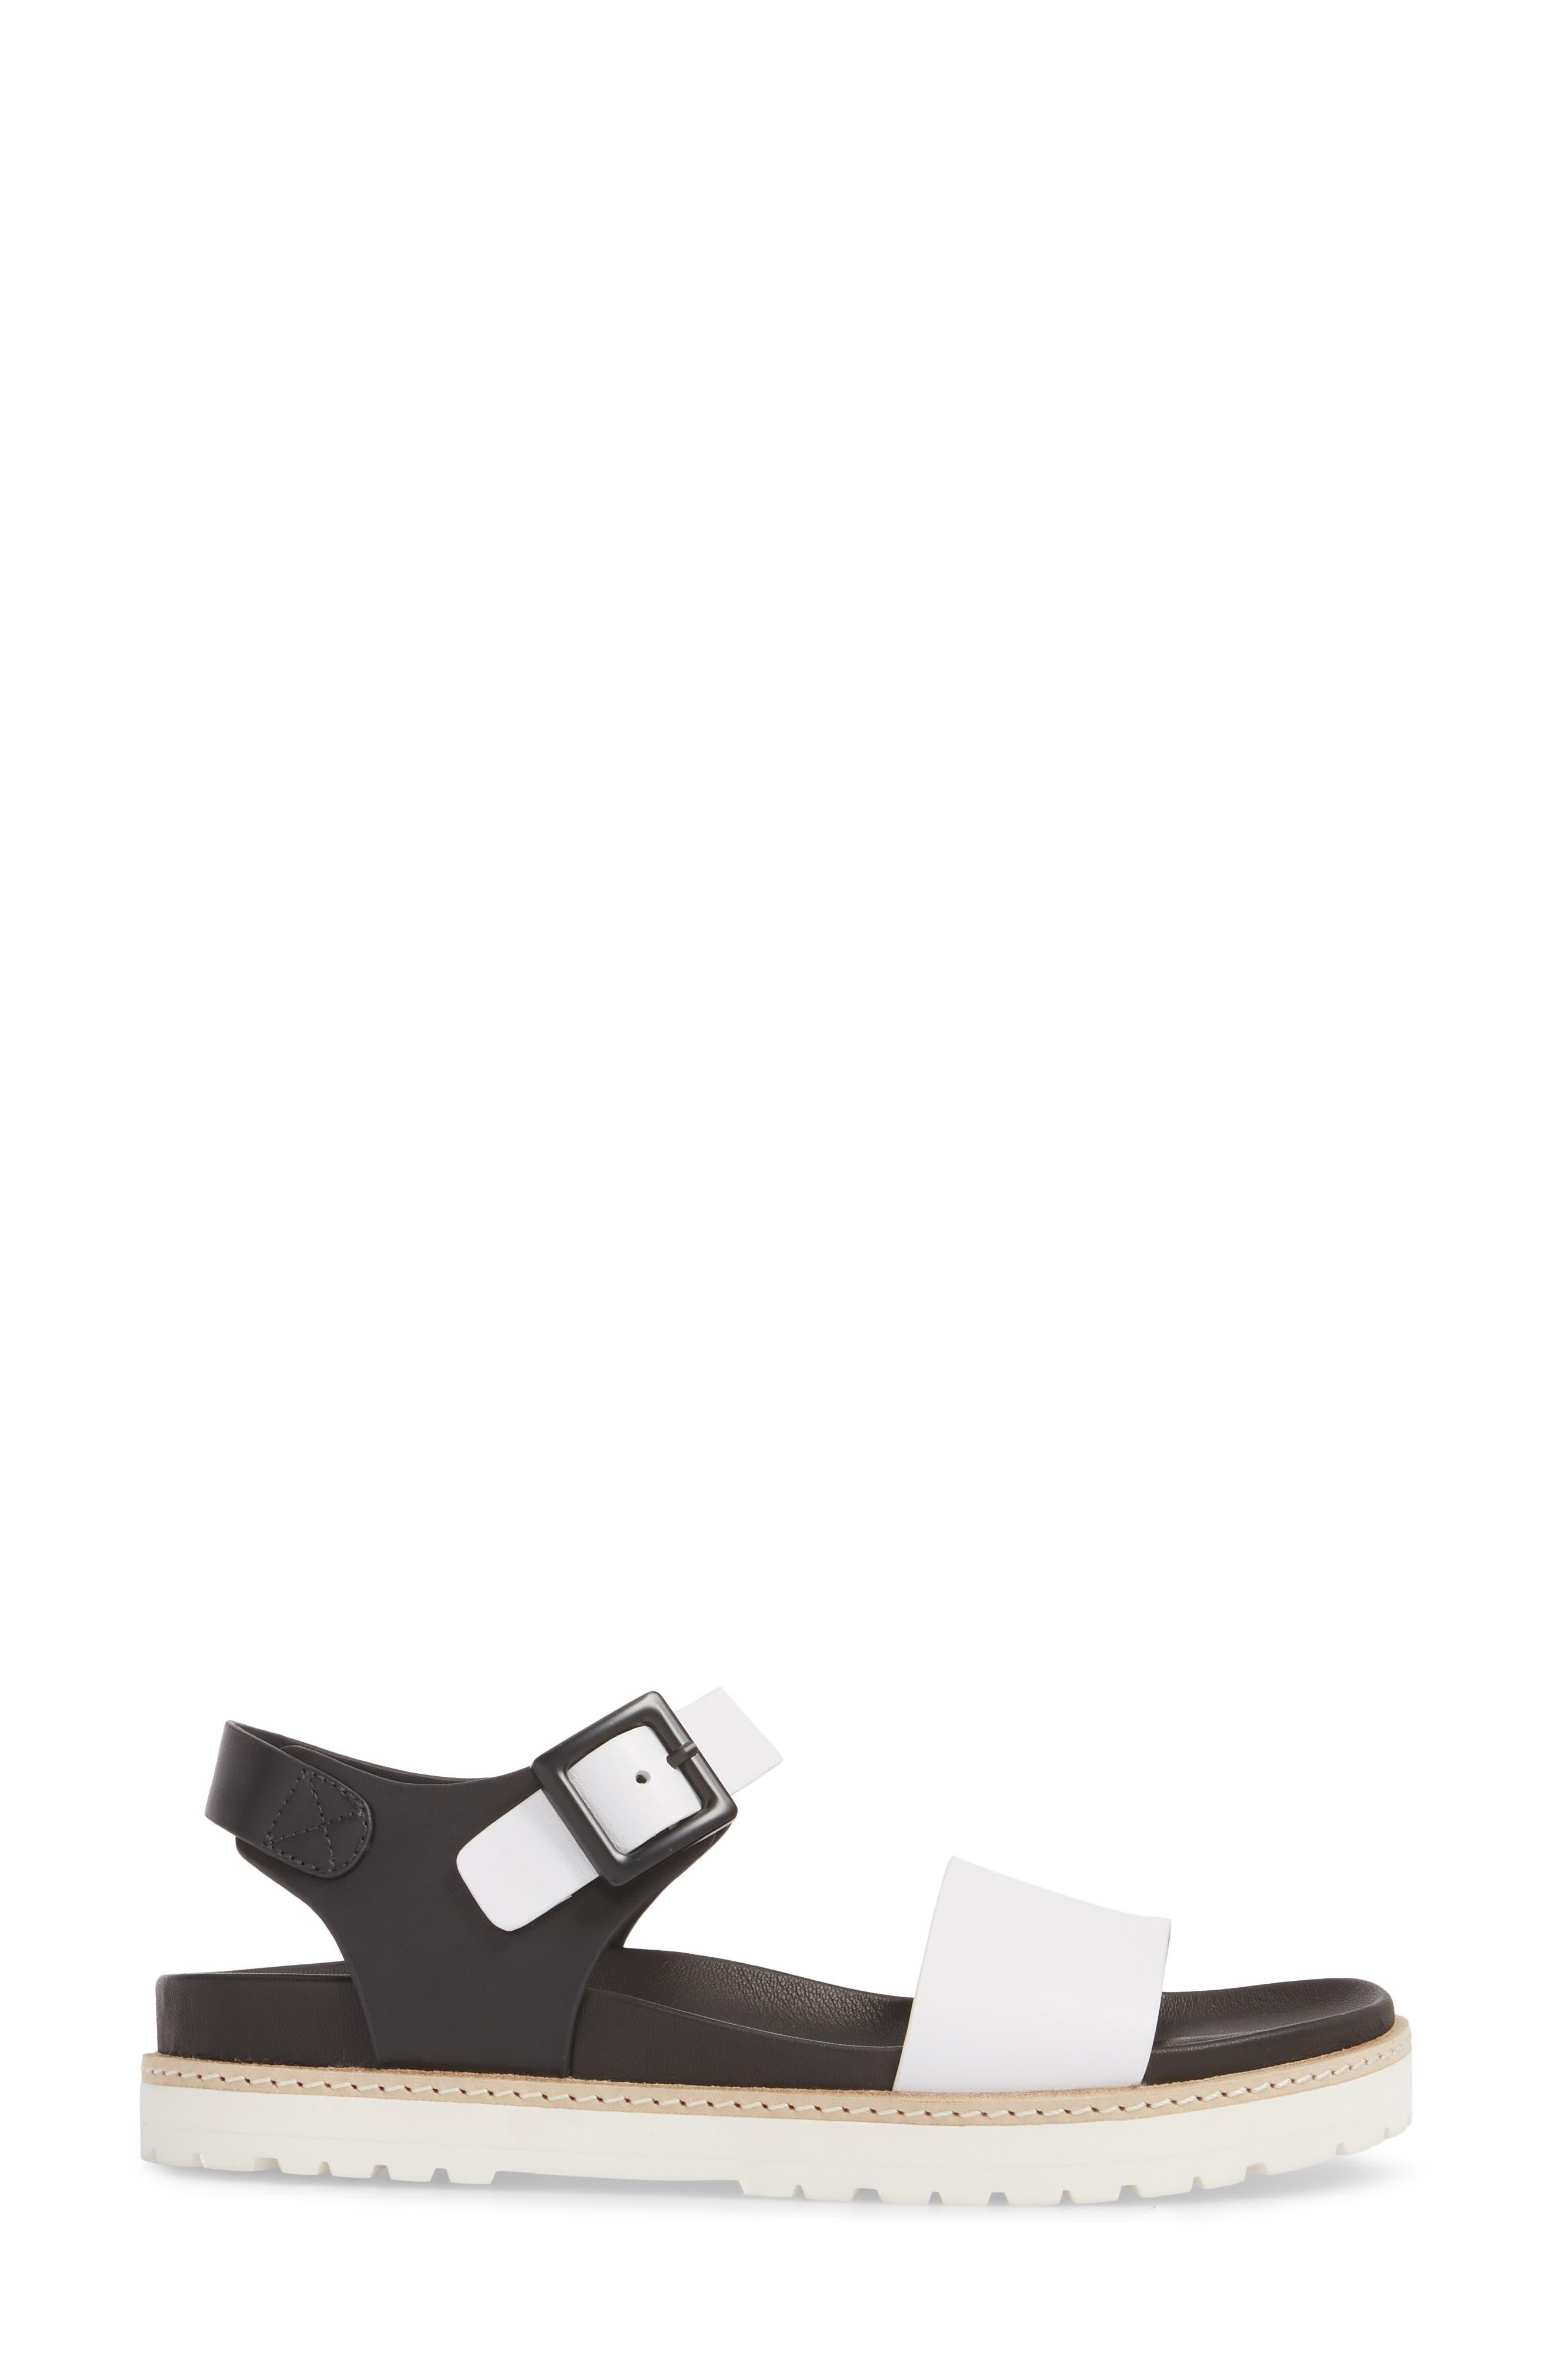 Ange Sandal,                             Alternate thumbnail 3, color,                             WHITE/ BLACK LEATHER